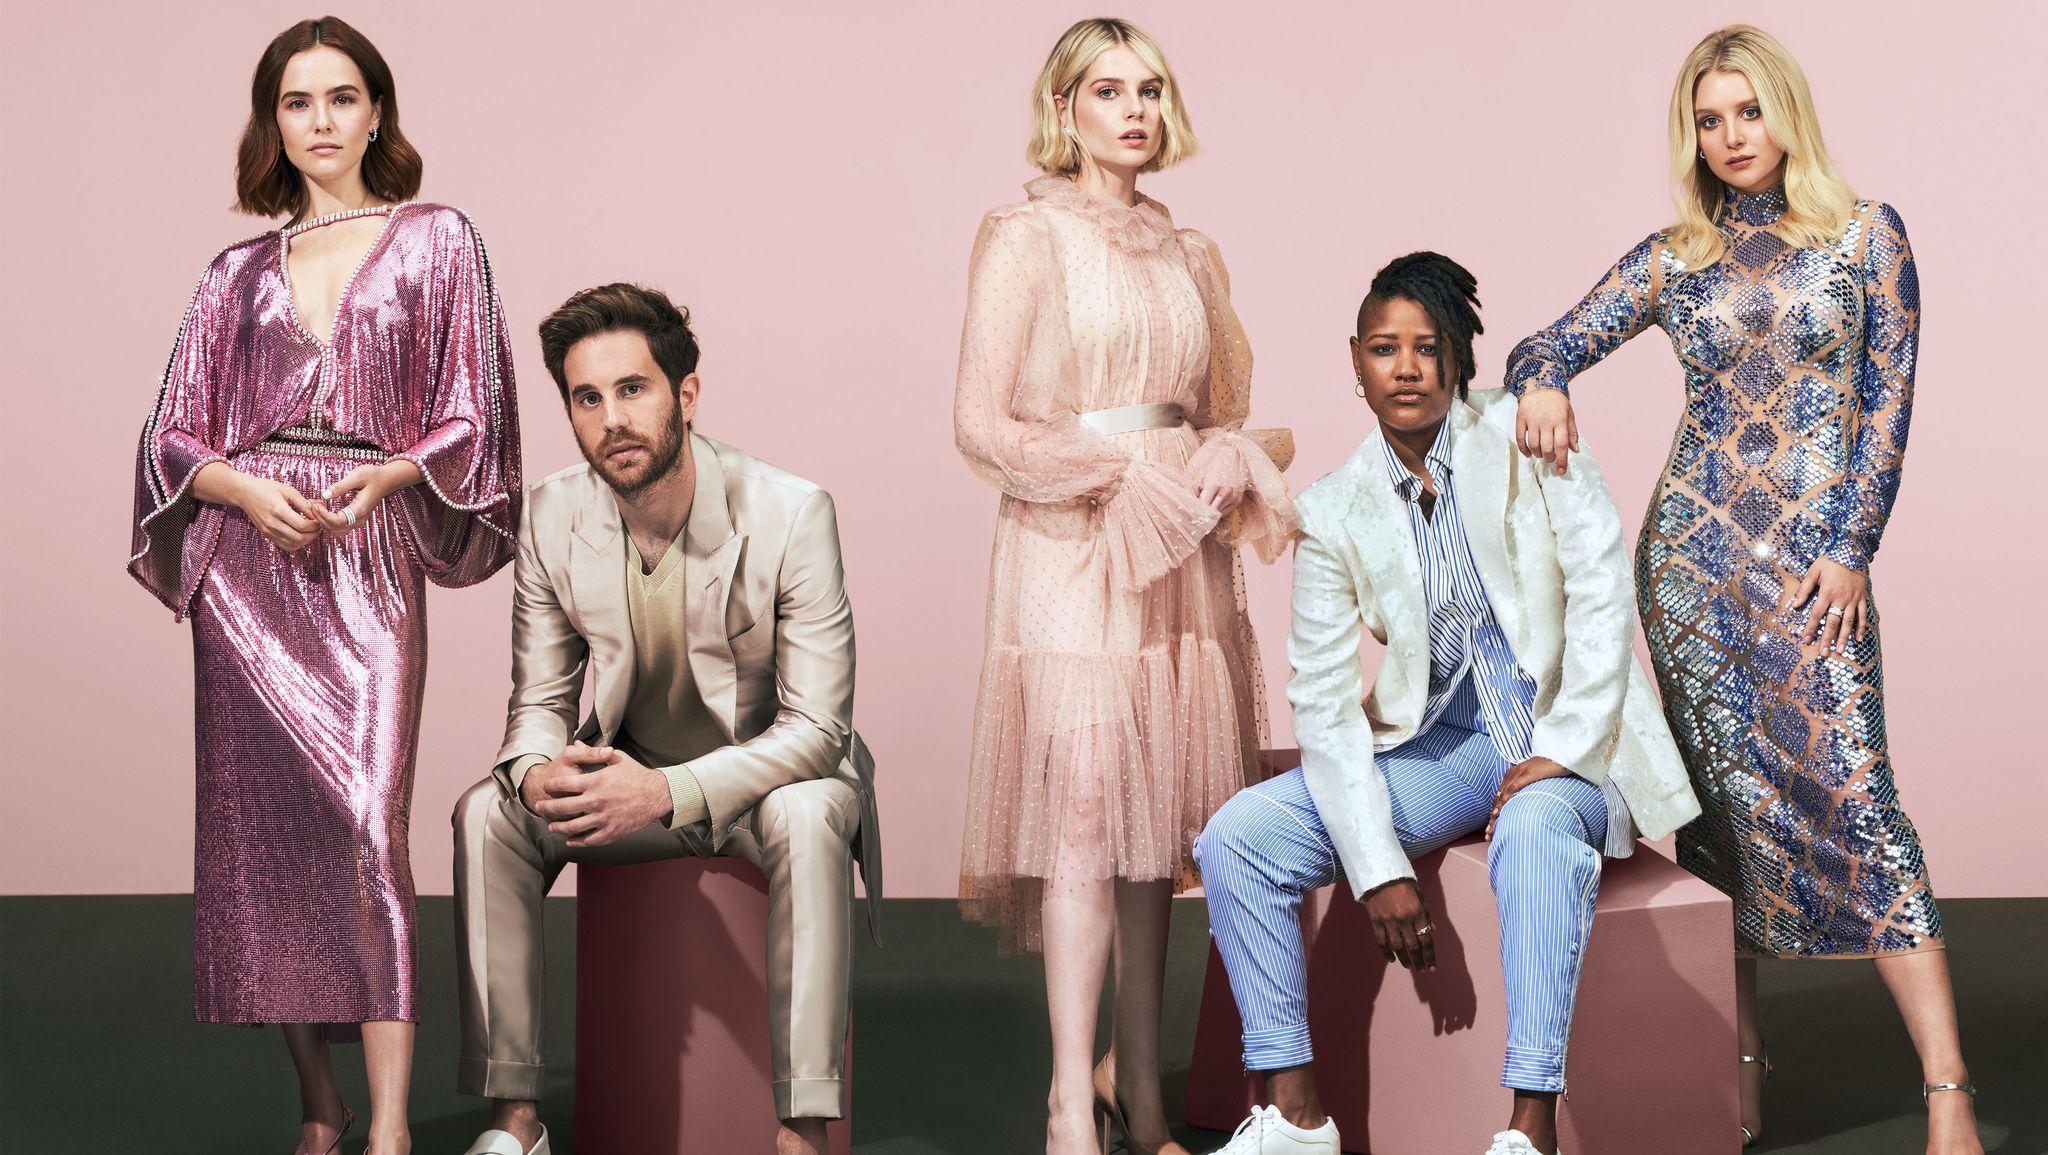 Nine Rising Stars on the Verge of Superstardom